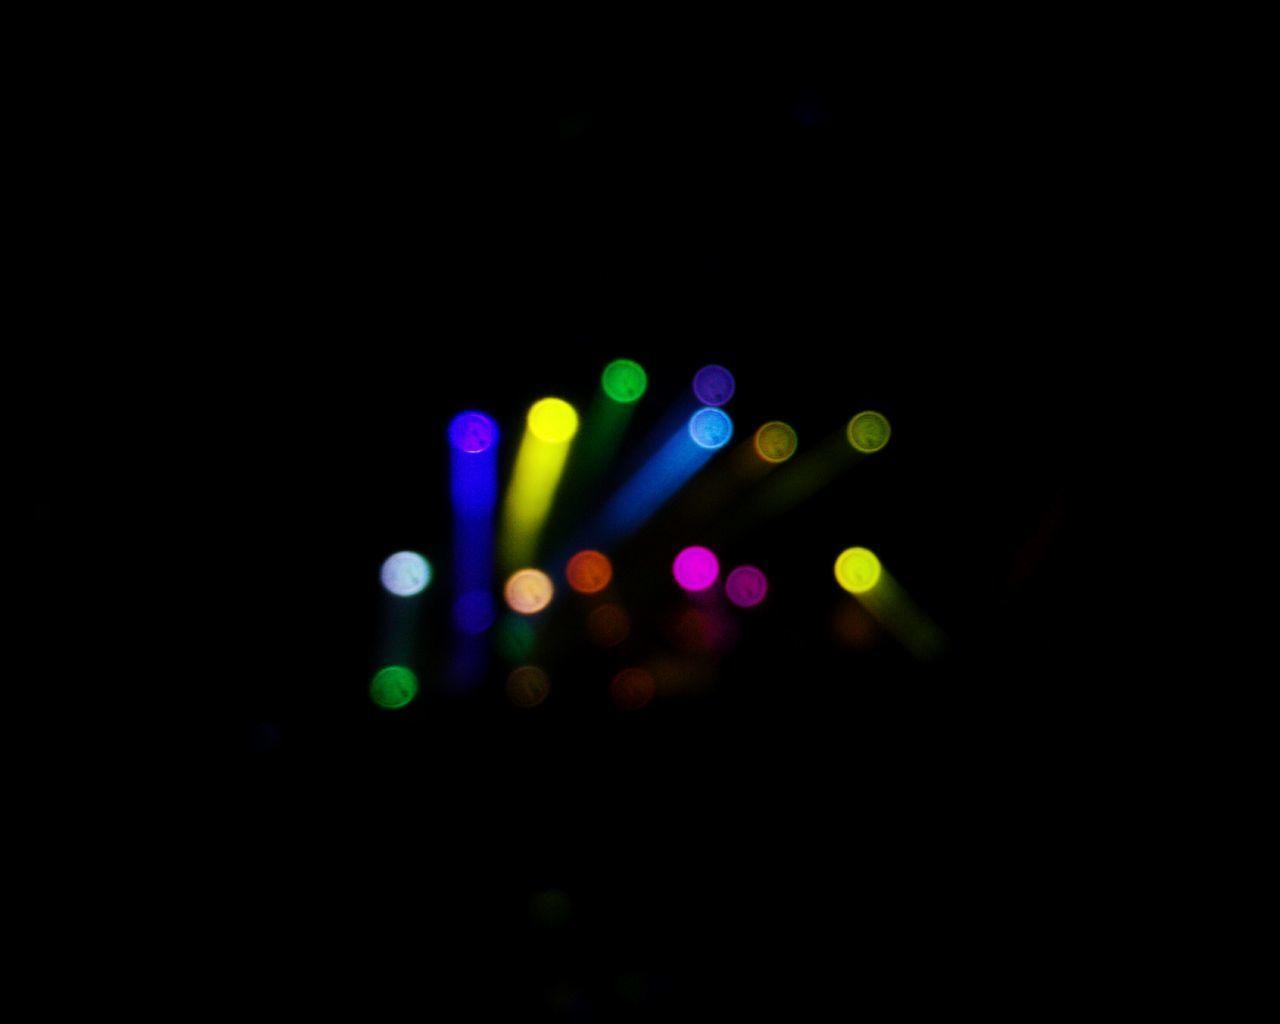 Illuminated Defocused Lighting Equipment Technology Multi Colored Fiber Optic No People Night Close-up Indoors  Bokeh Lights Getty Images EyeEm Team Bokeh Bokeh Photography Neon Life